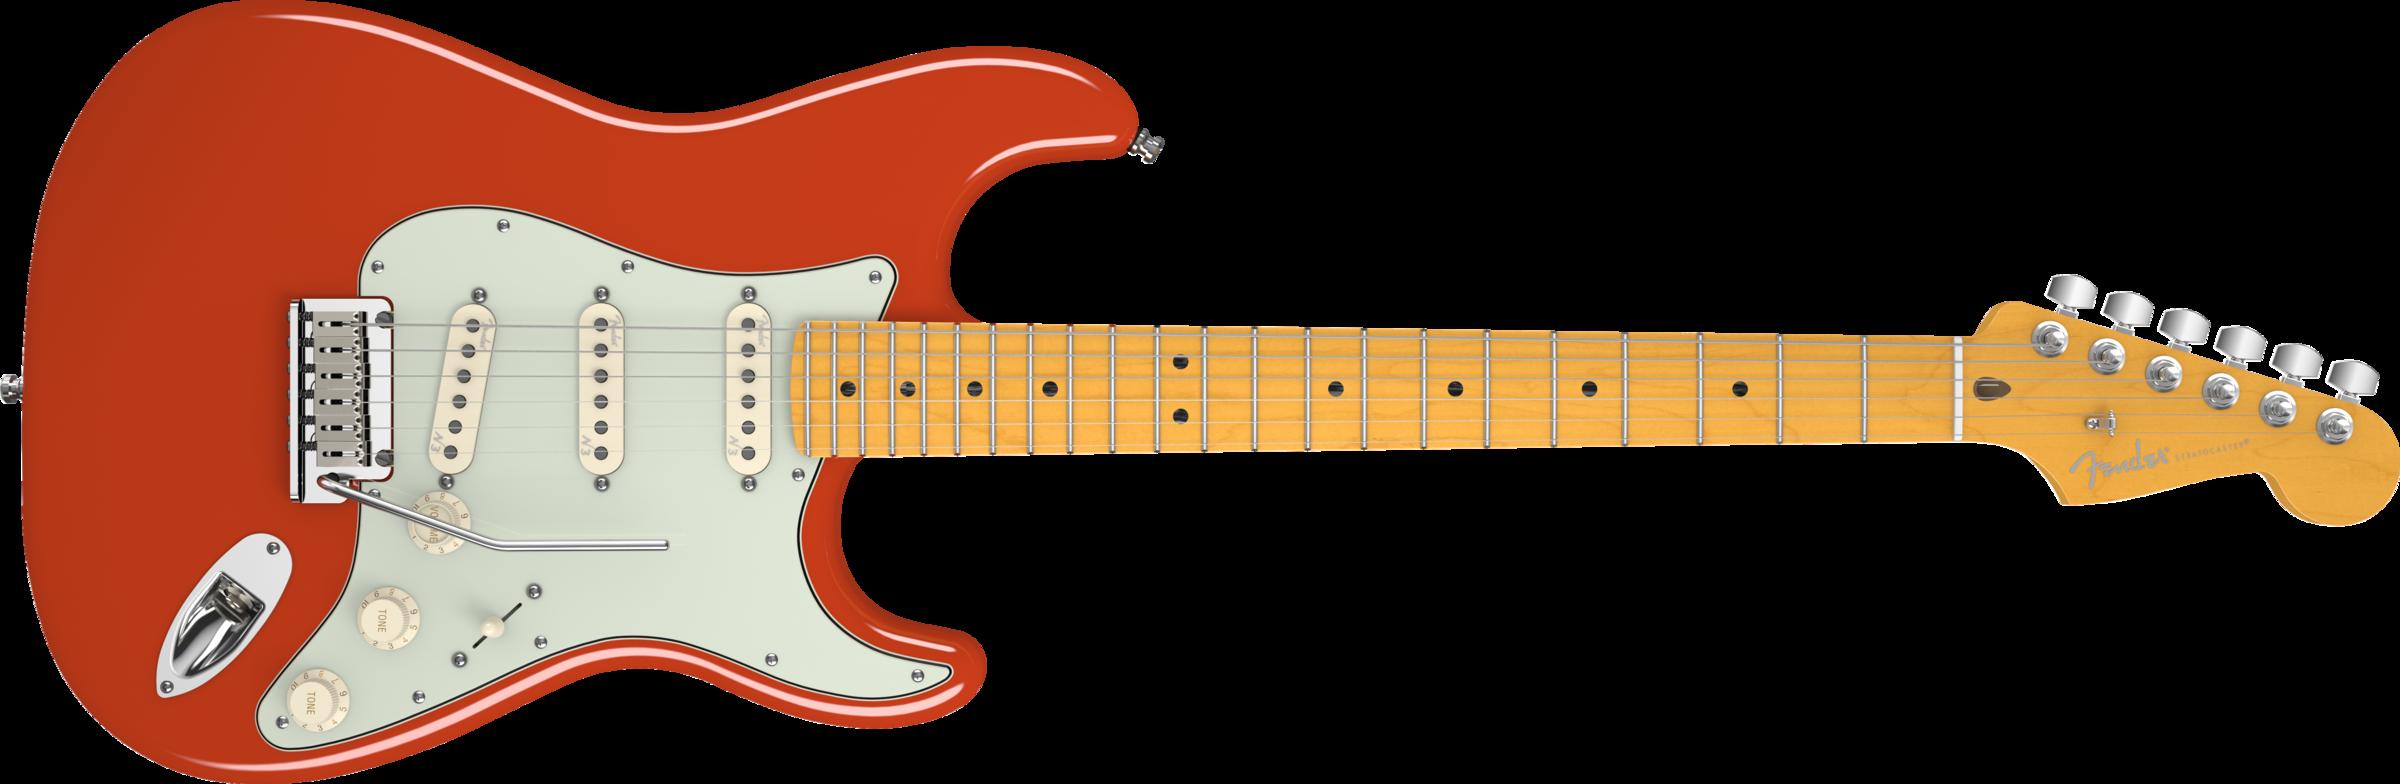 Clipart guitar fiesta. Fender forums view topic